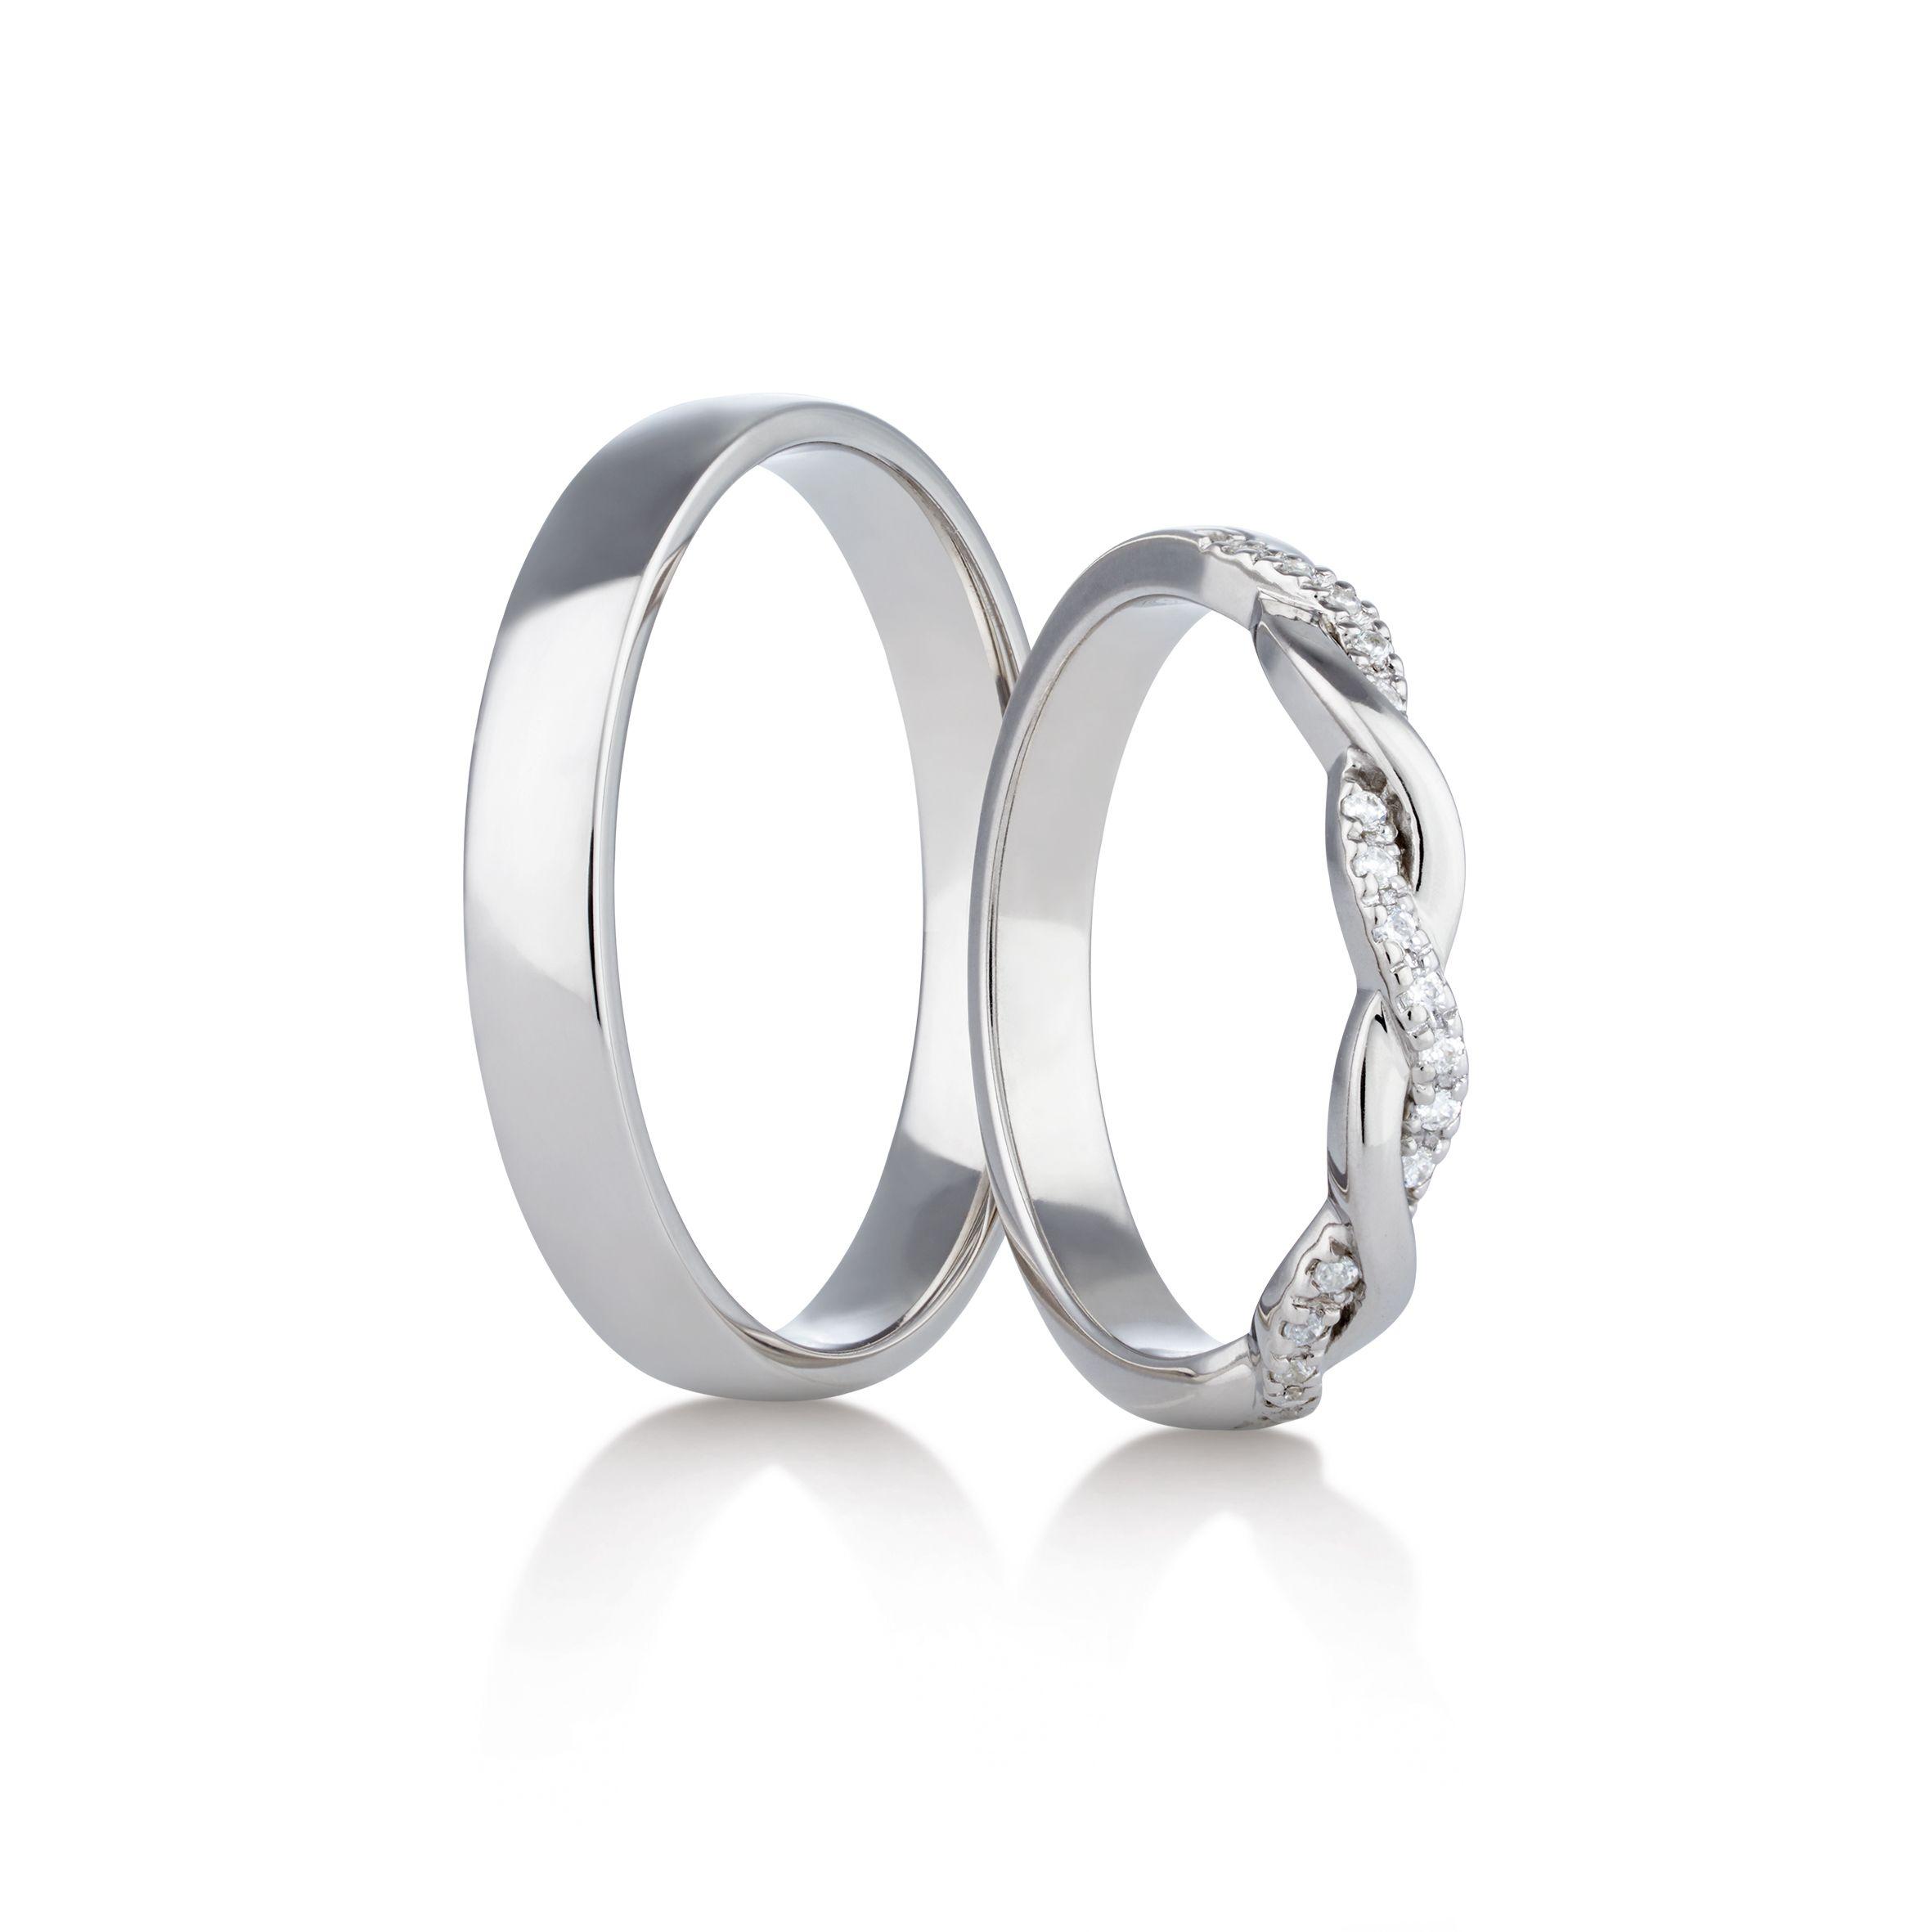 Snubni Prsteny Model C 293 04 Bile Palladium Prsteny Panske Prsteny Zasnubni Prstynek